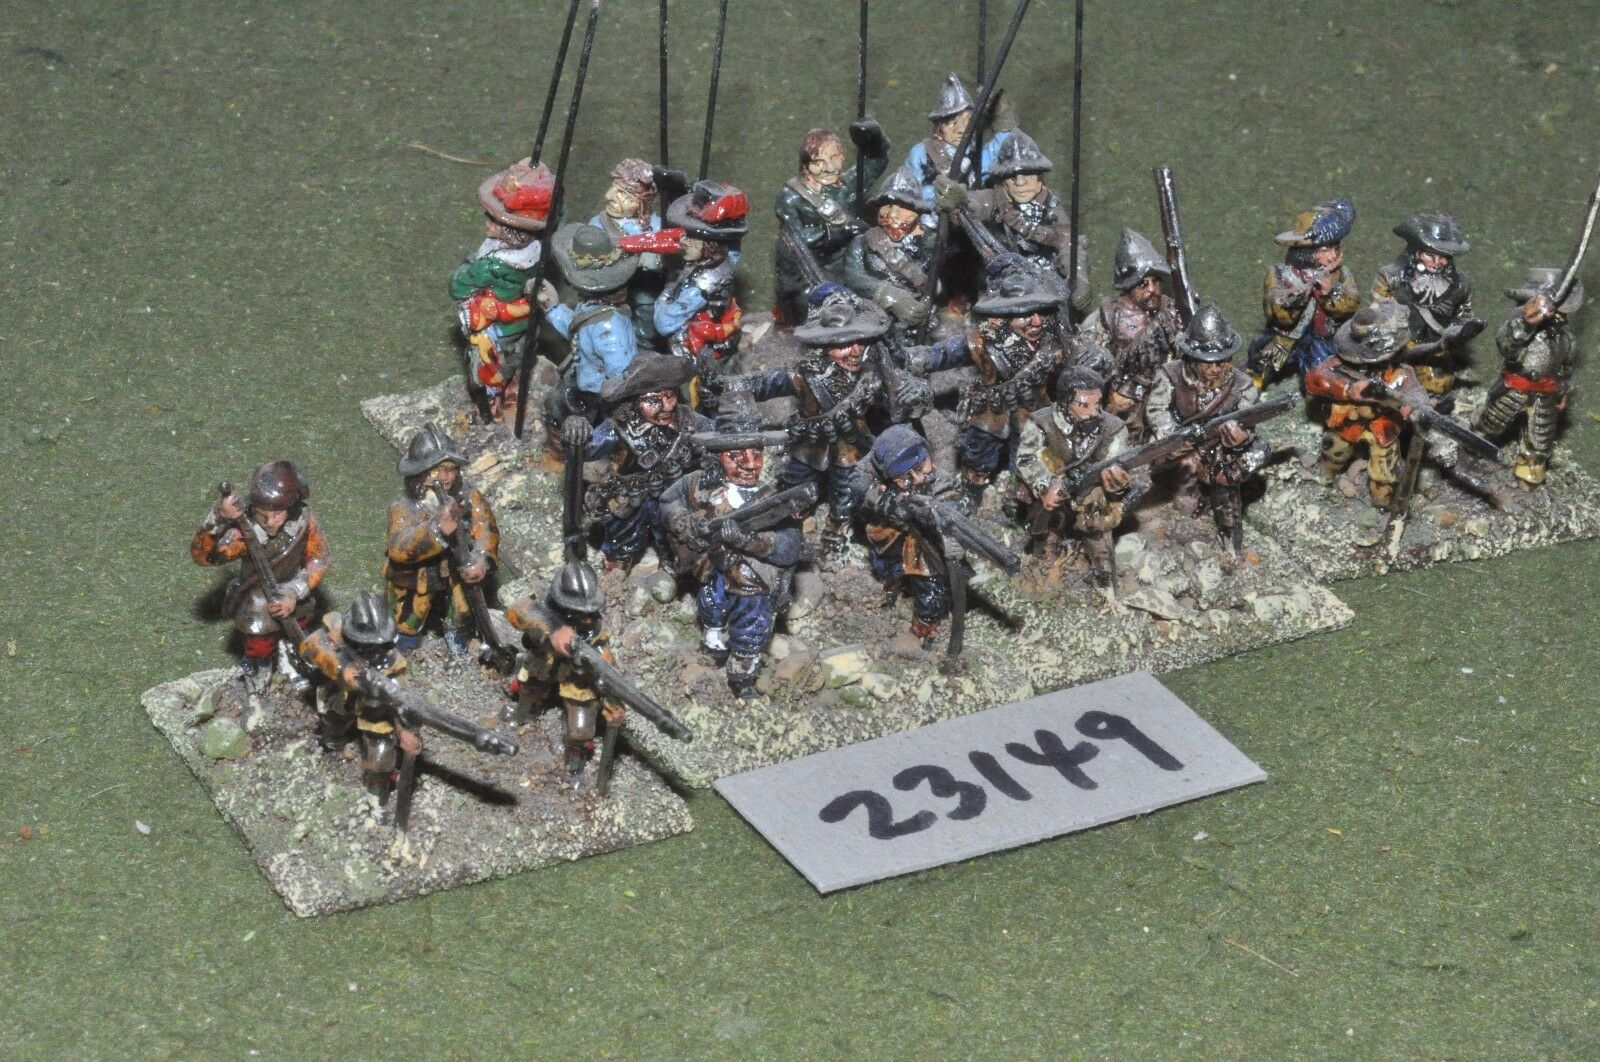 25mm ECW   parliament - pike & shot 24 figures - inf (23149)